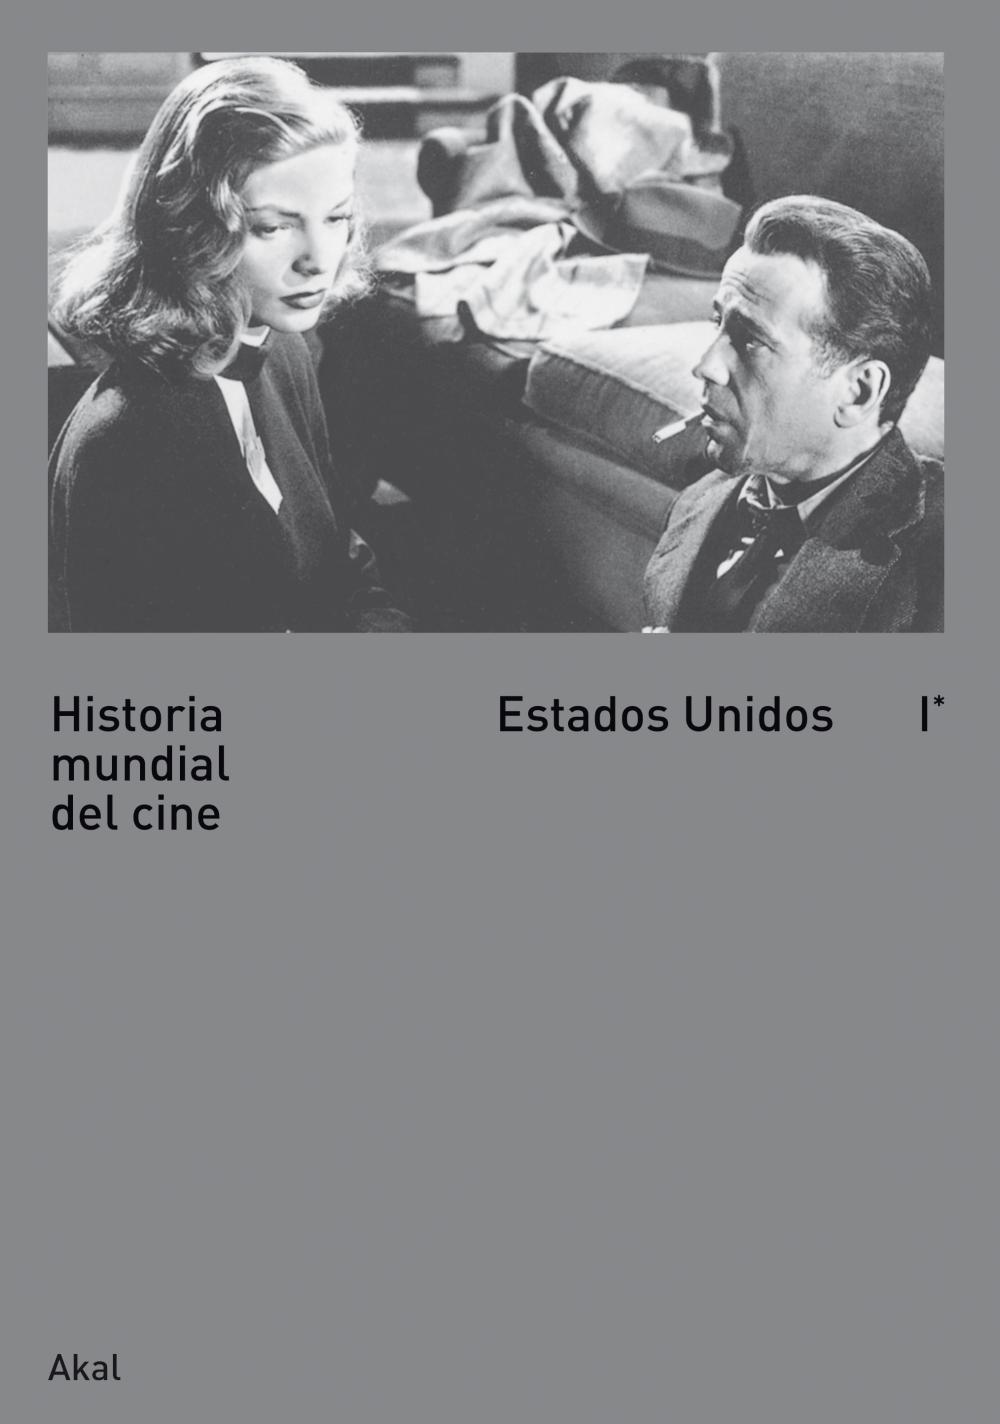 Historia mundial del cine I